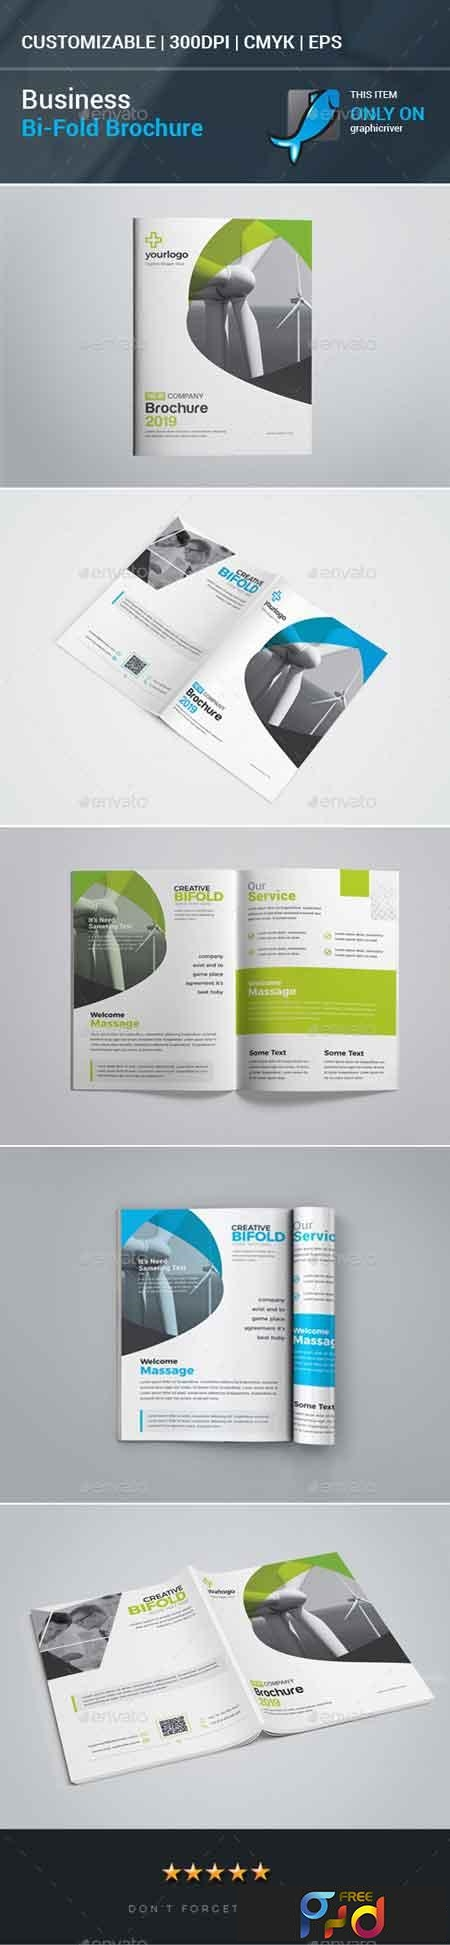 Business Bifold Brochure 23172745 1